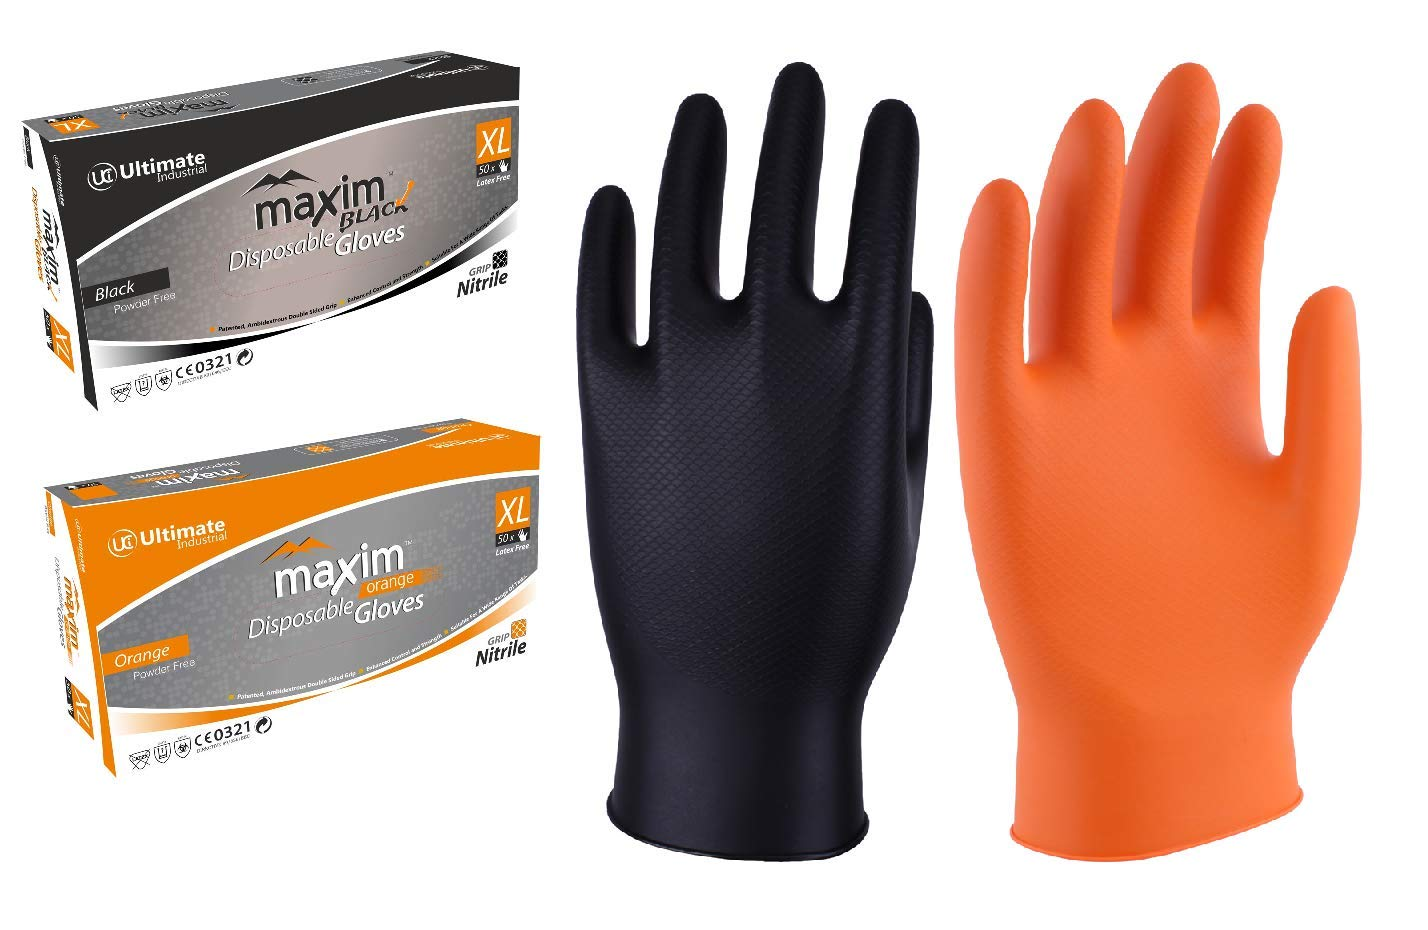 UCI 4 mil 100 x Black Nitrile Powder Free Disposable Gloves